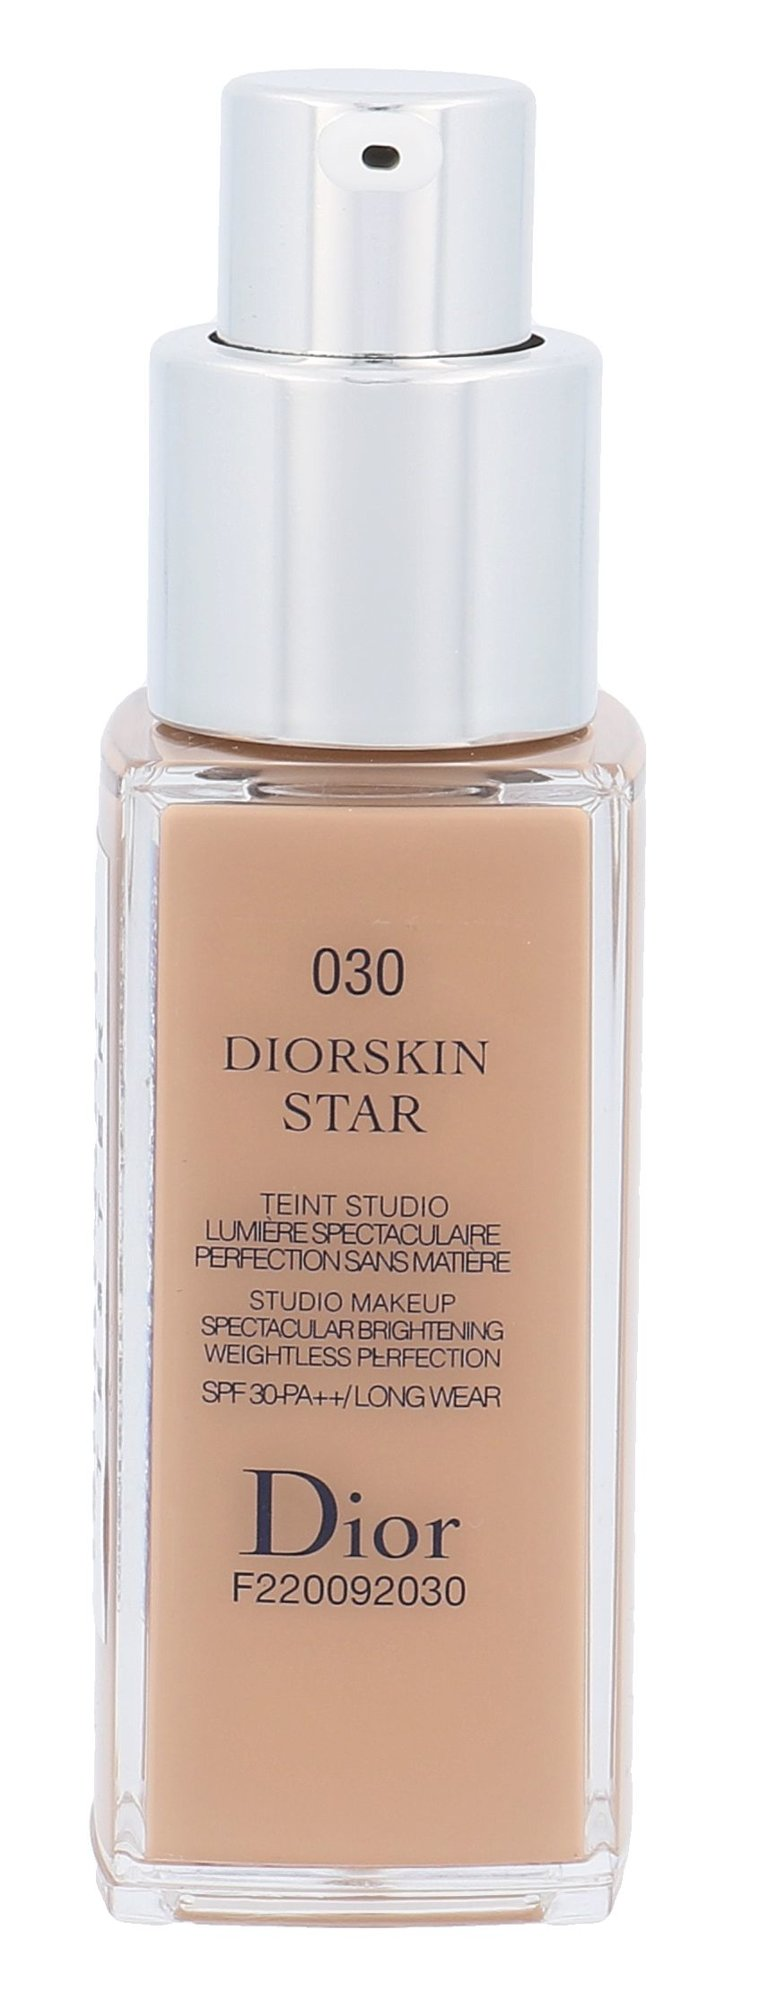 Christian Dior Diorskin Star Cosmetic 20ml 030 Medium Beige